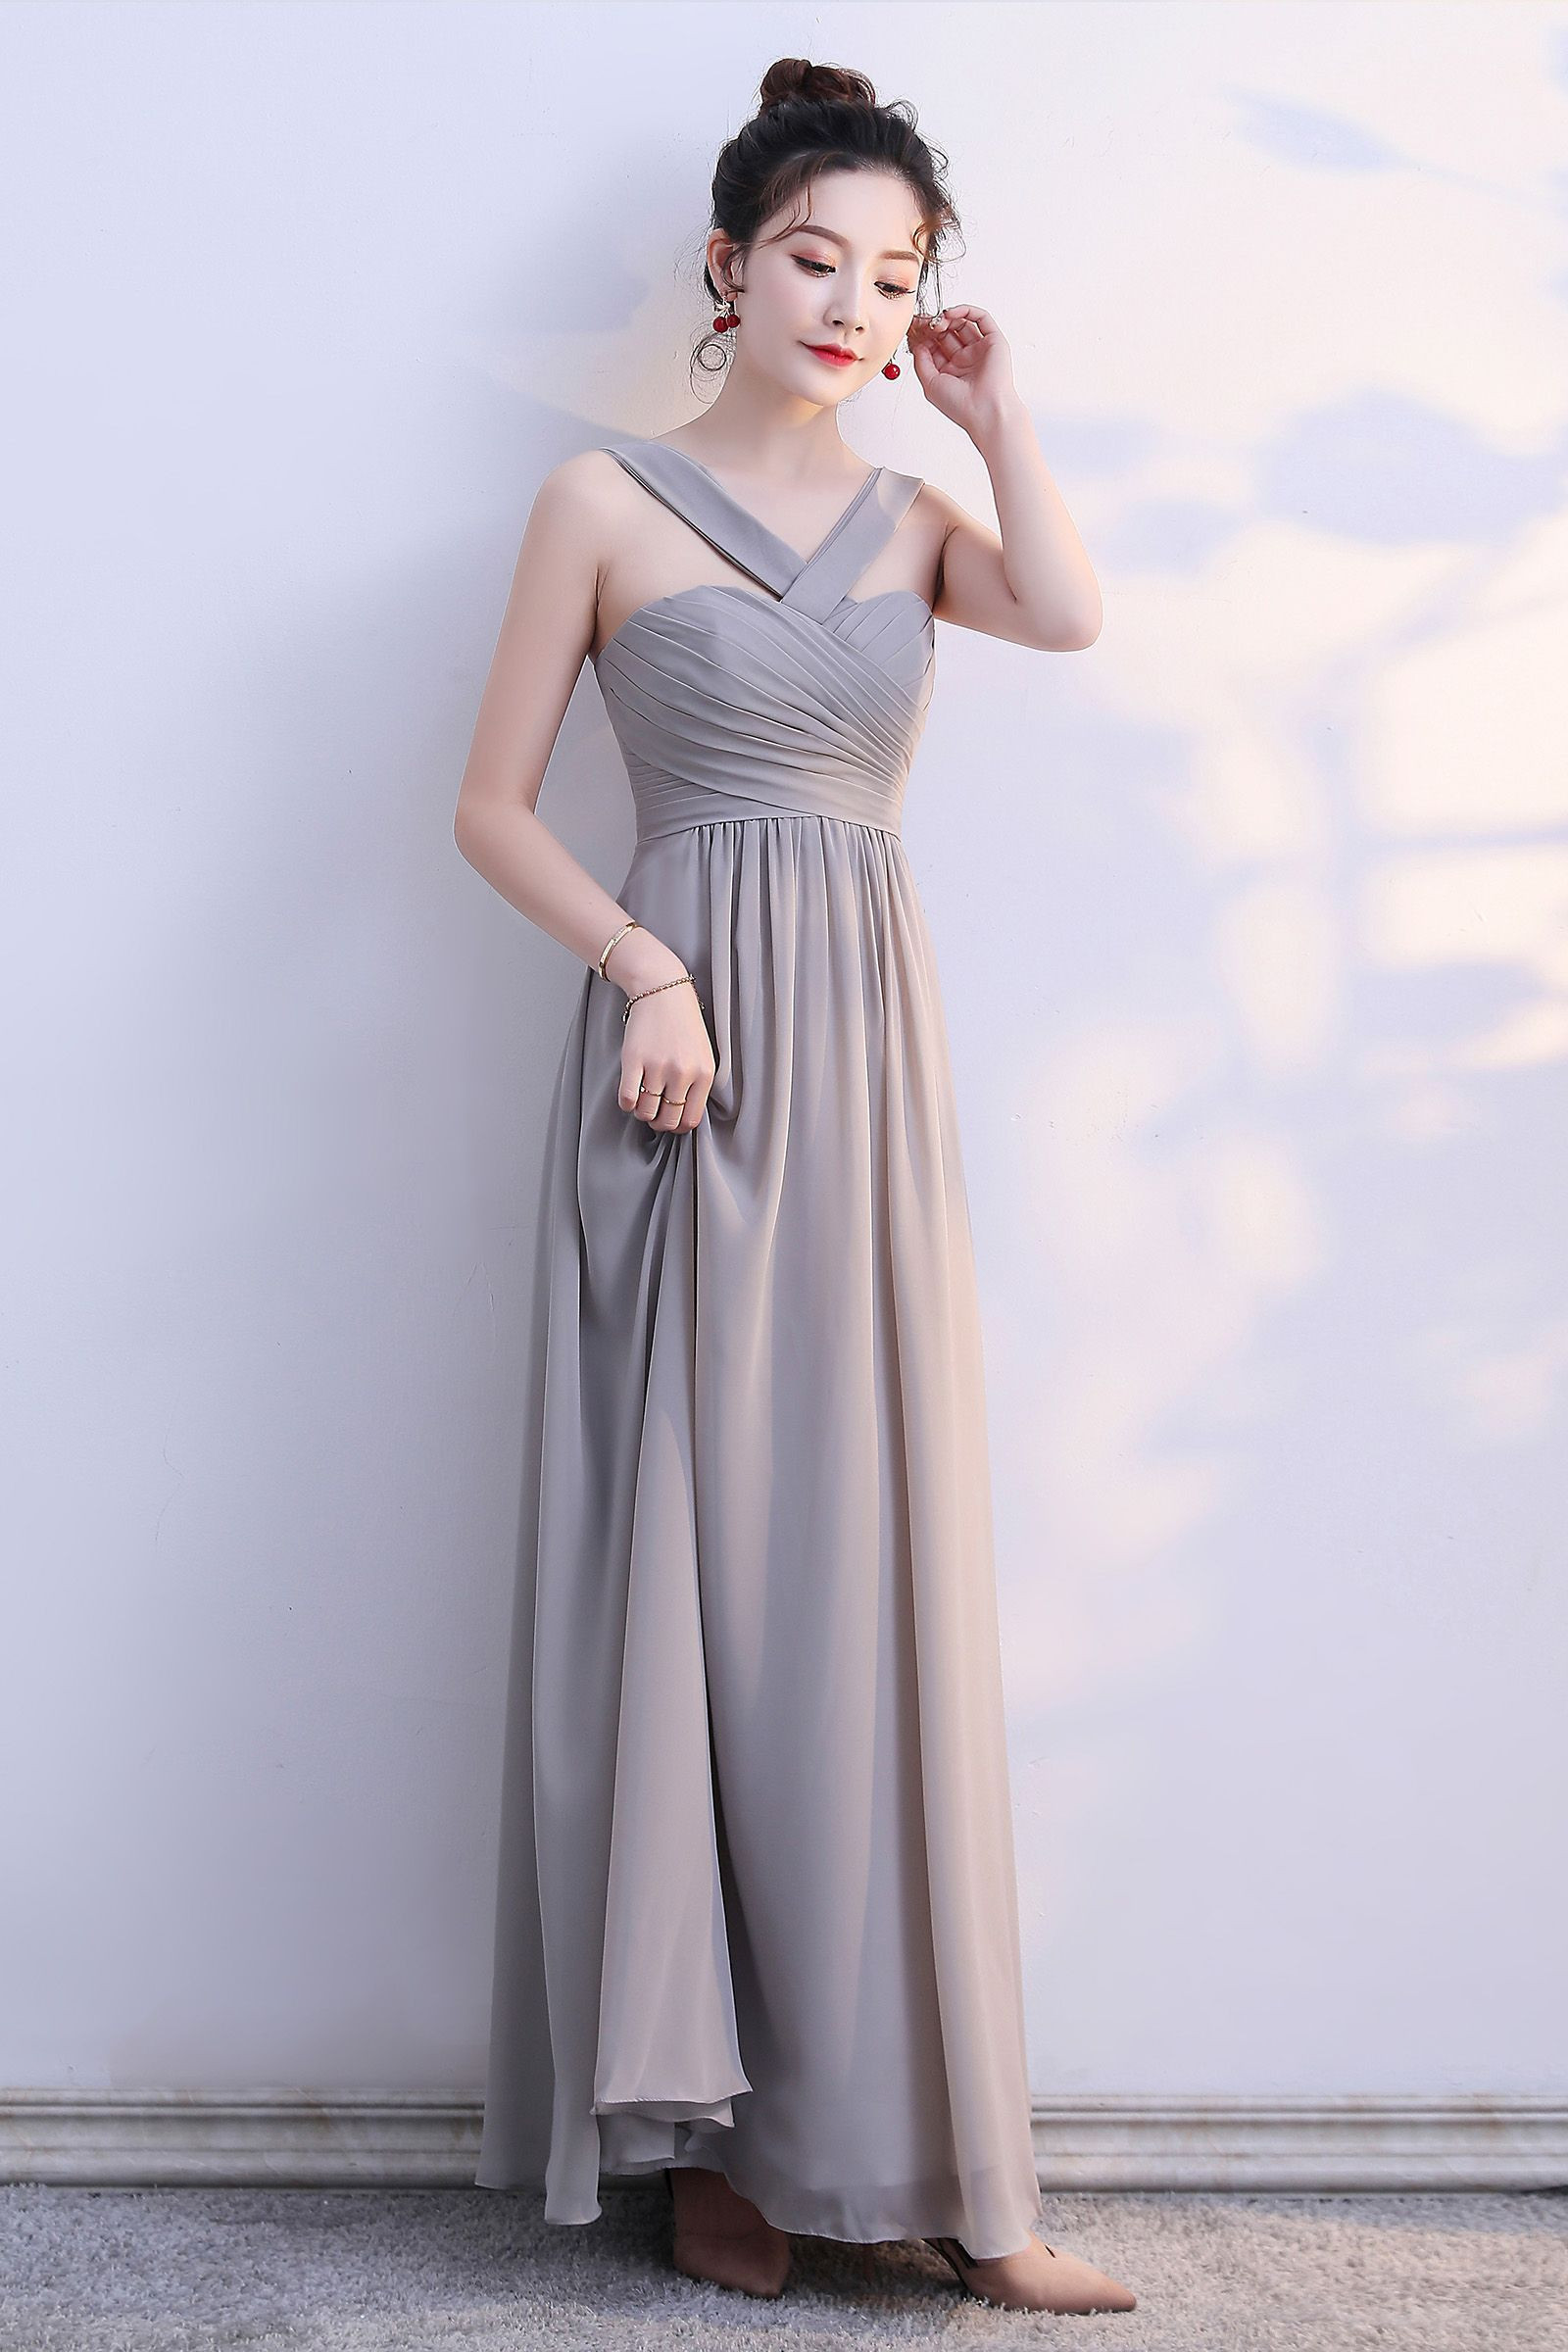 Gray Chiffon Prom Gown Evening Dress